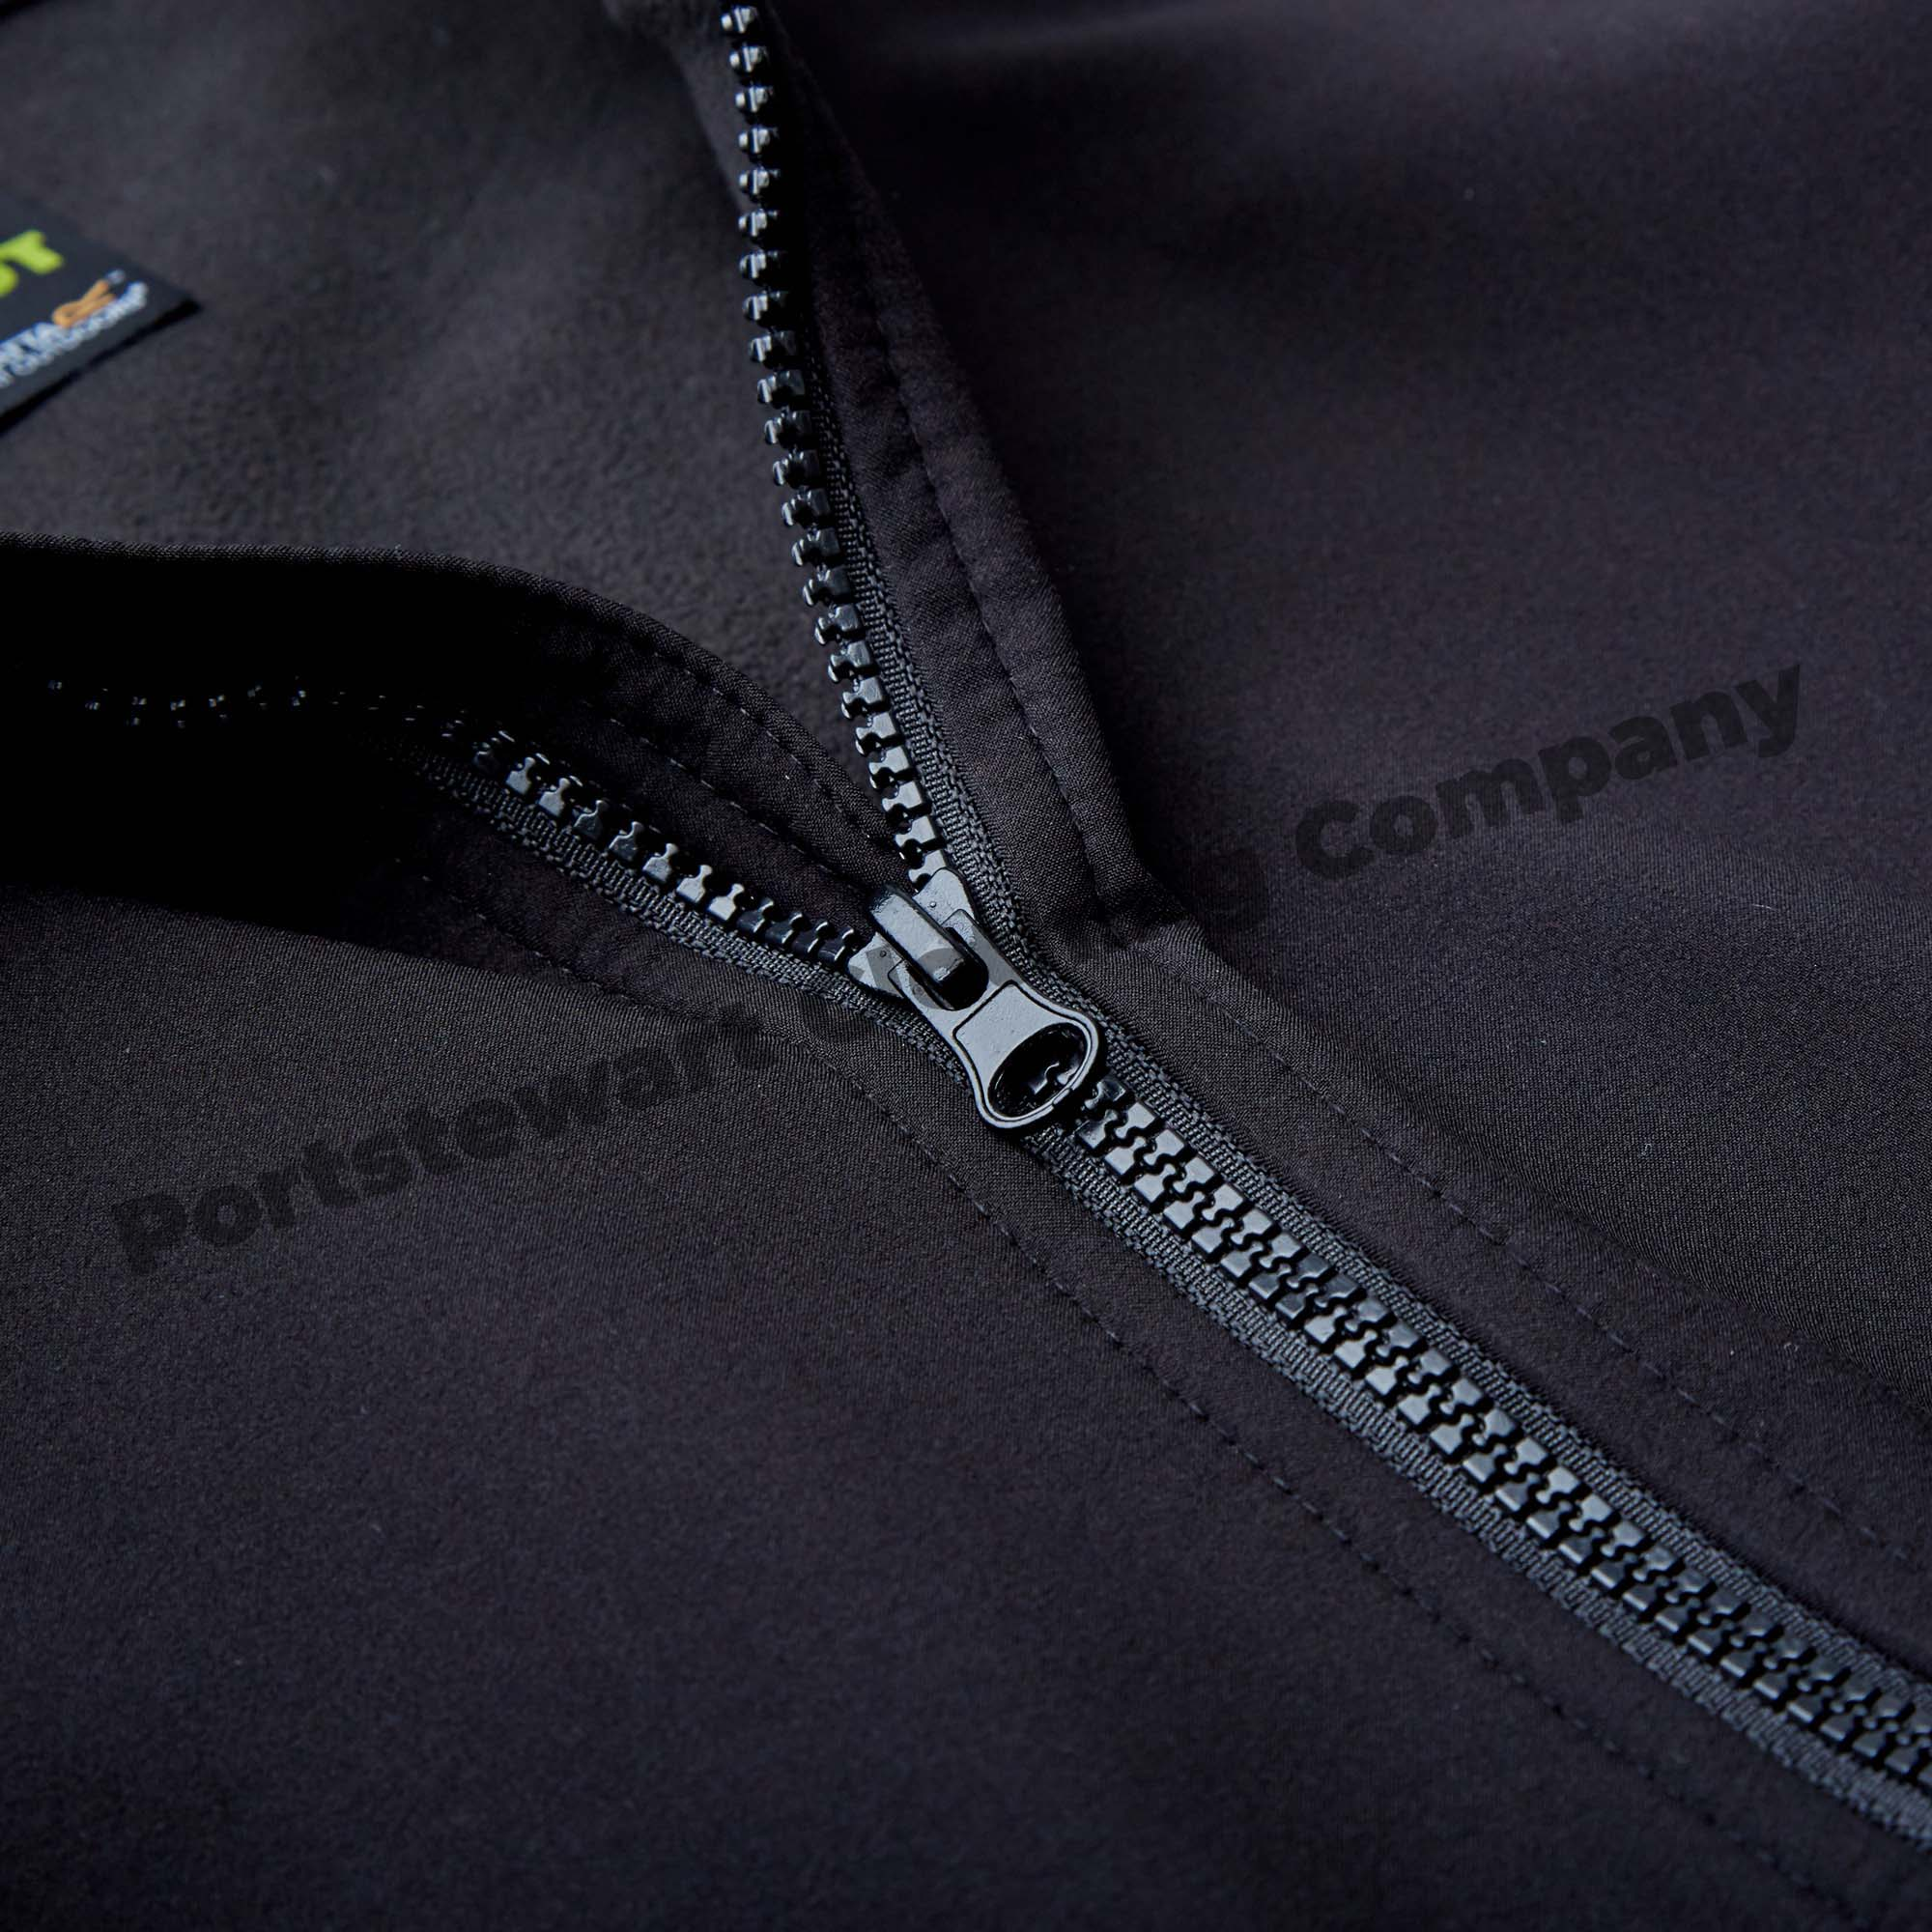 Regatta-Mens-Soft-Shell-Windproof-Workwear-Softshell-Jacket-Coat-RRP-50 thumbnail 4